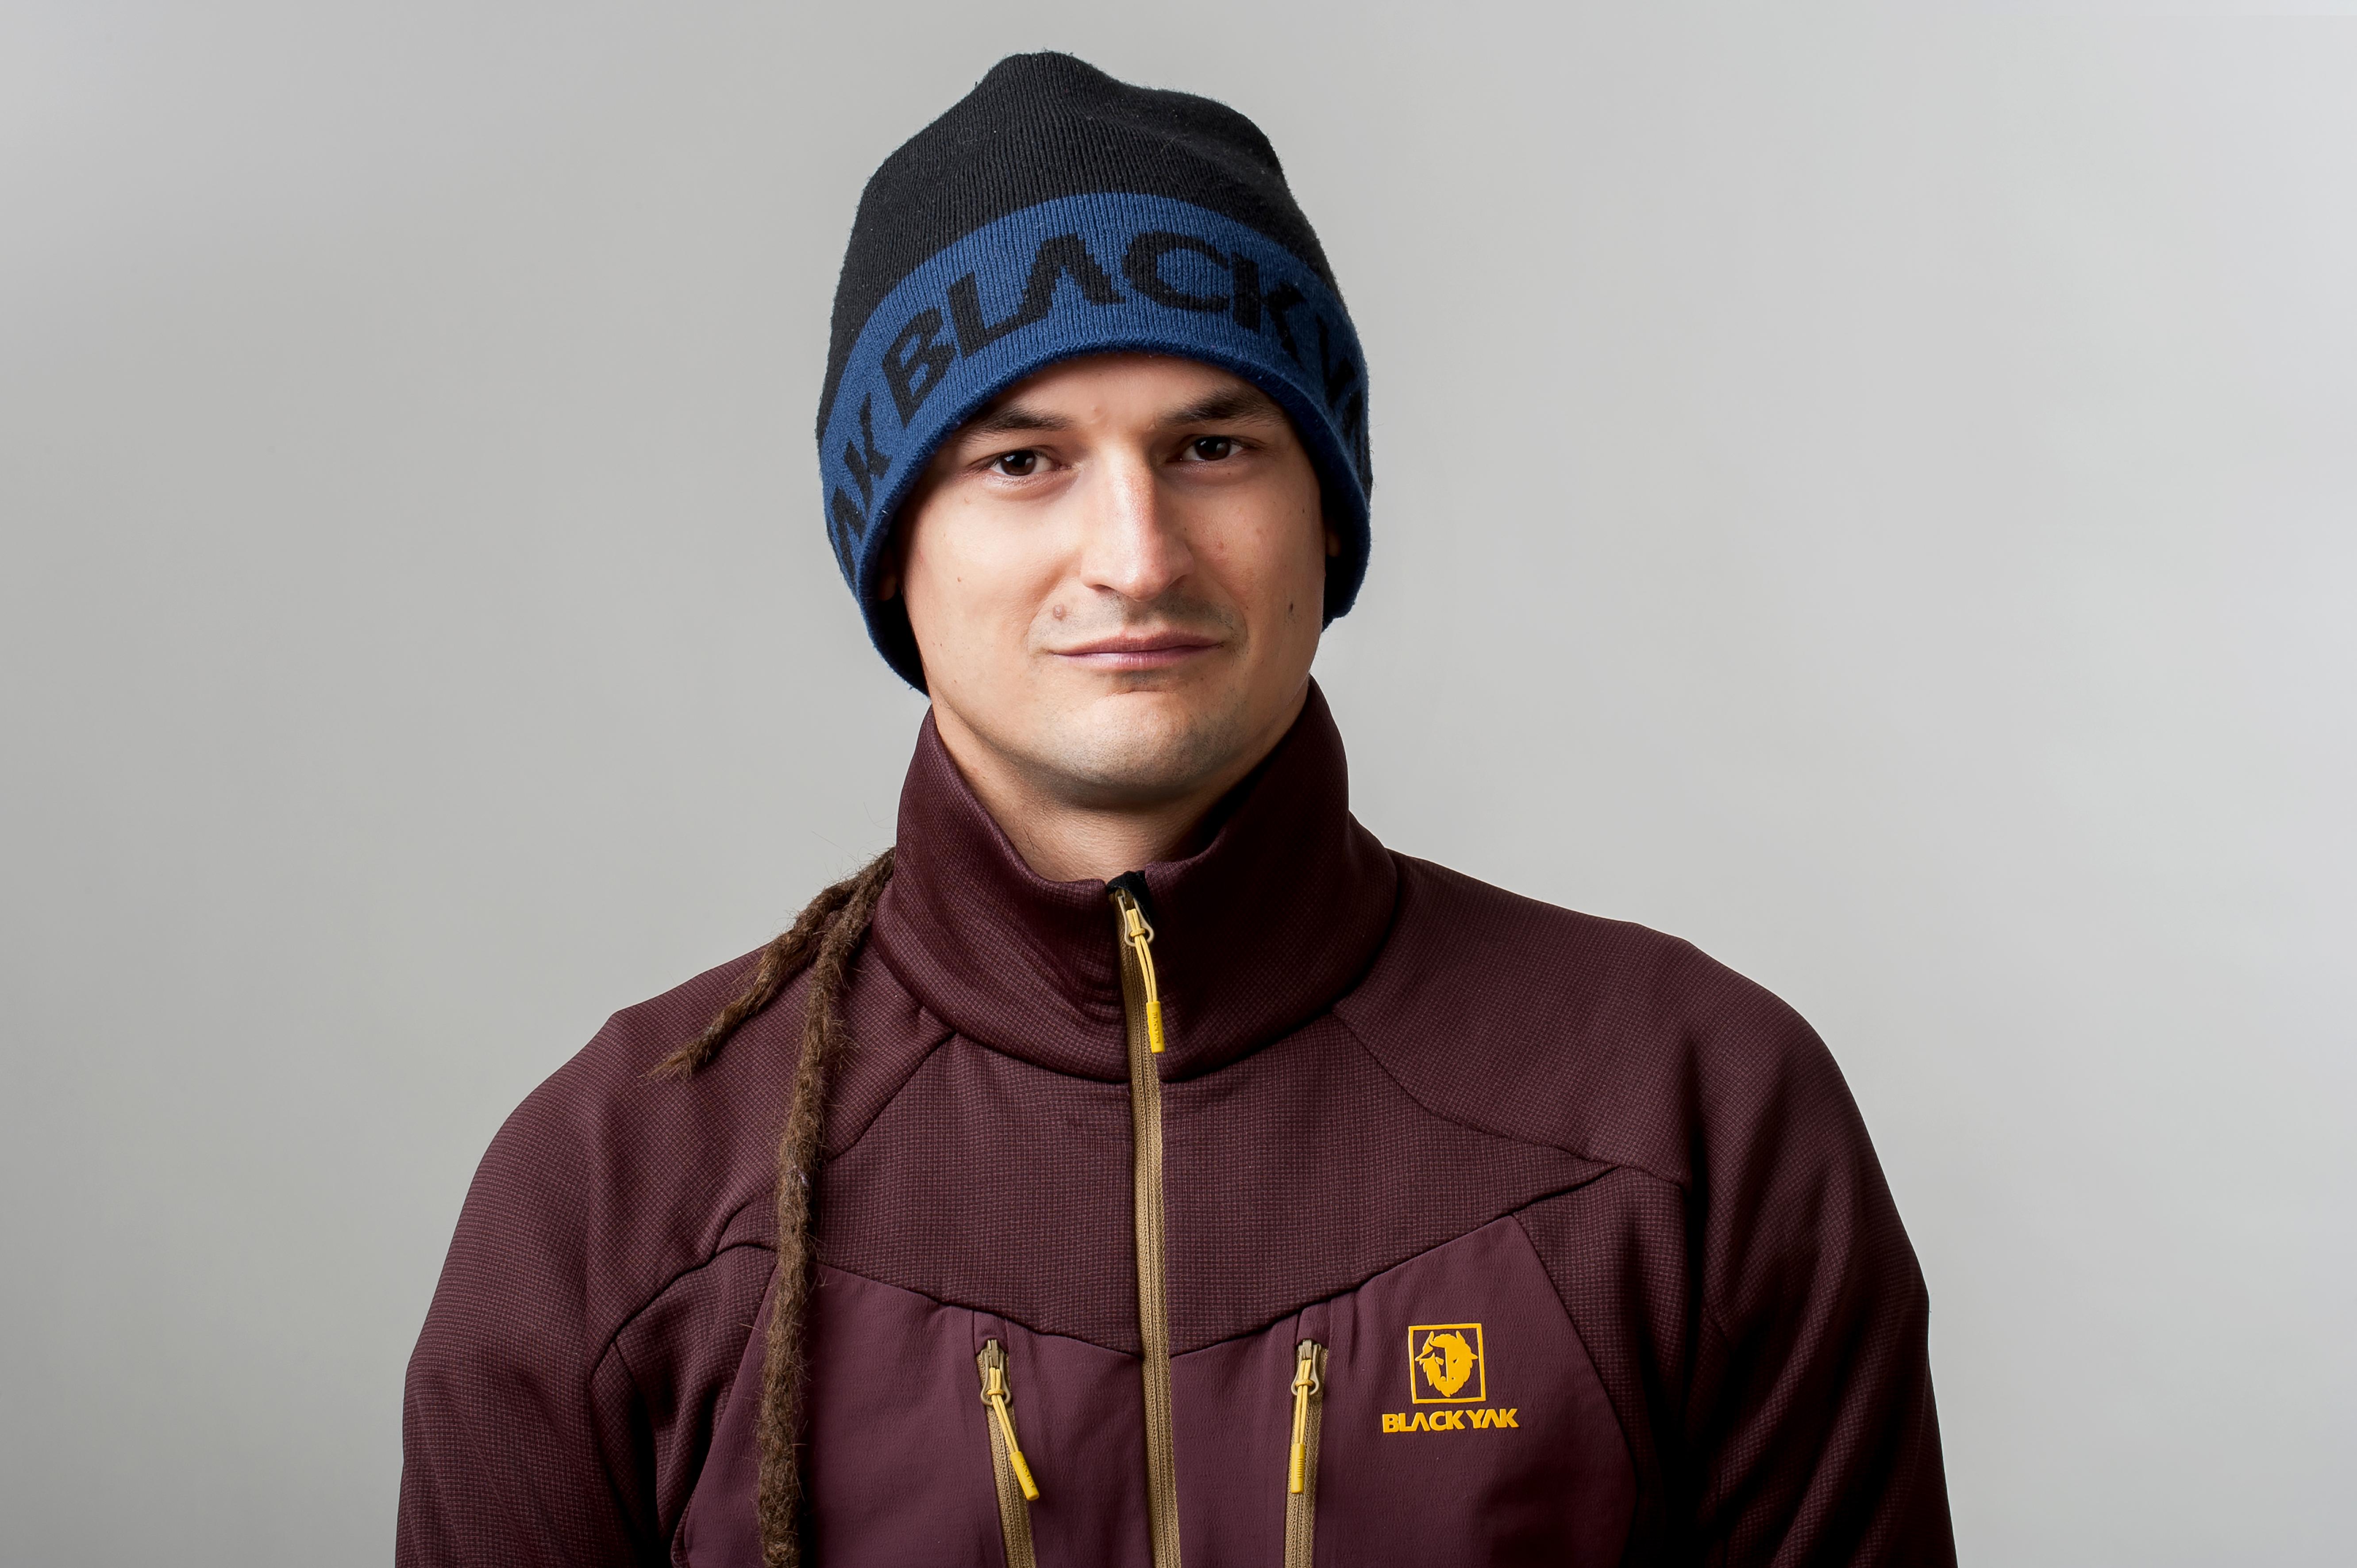 Adam Bielecki, born in Tychy, Poland, 1983